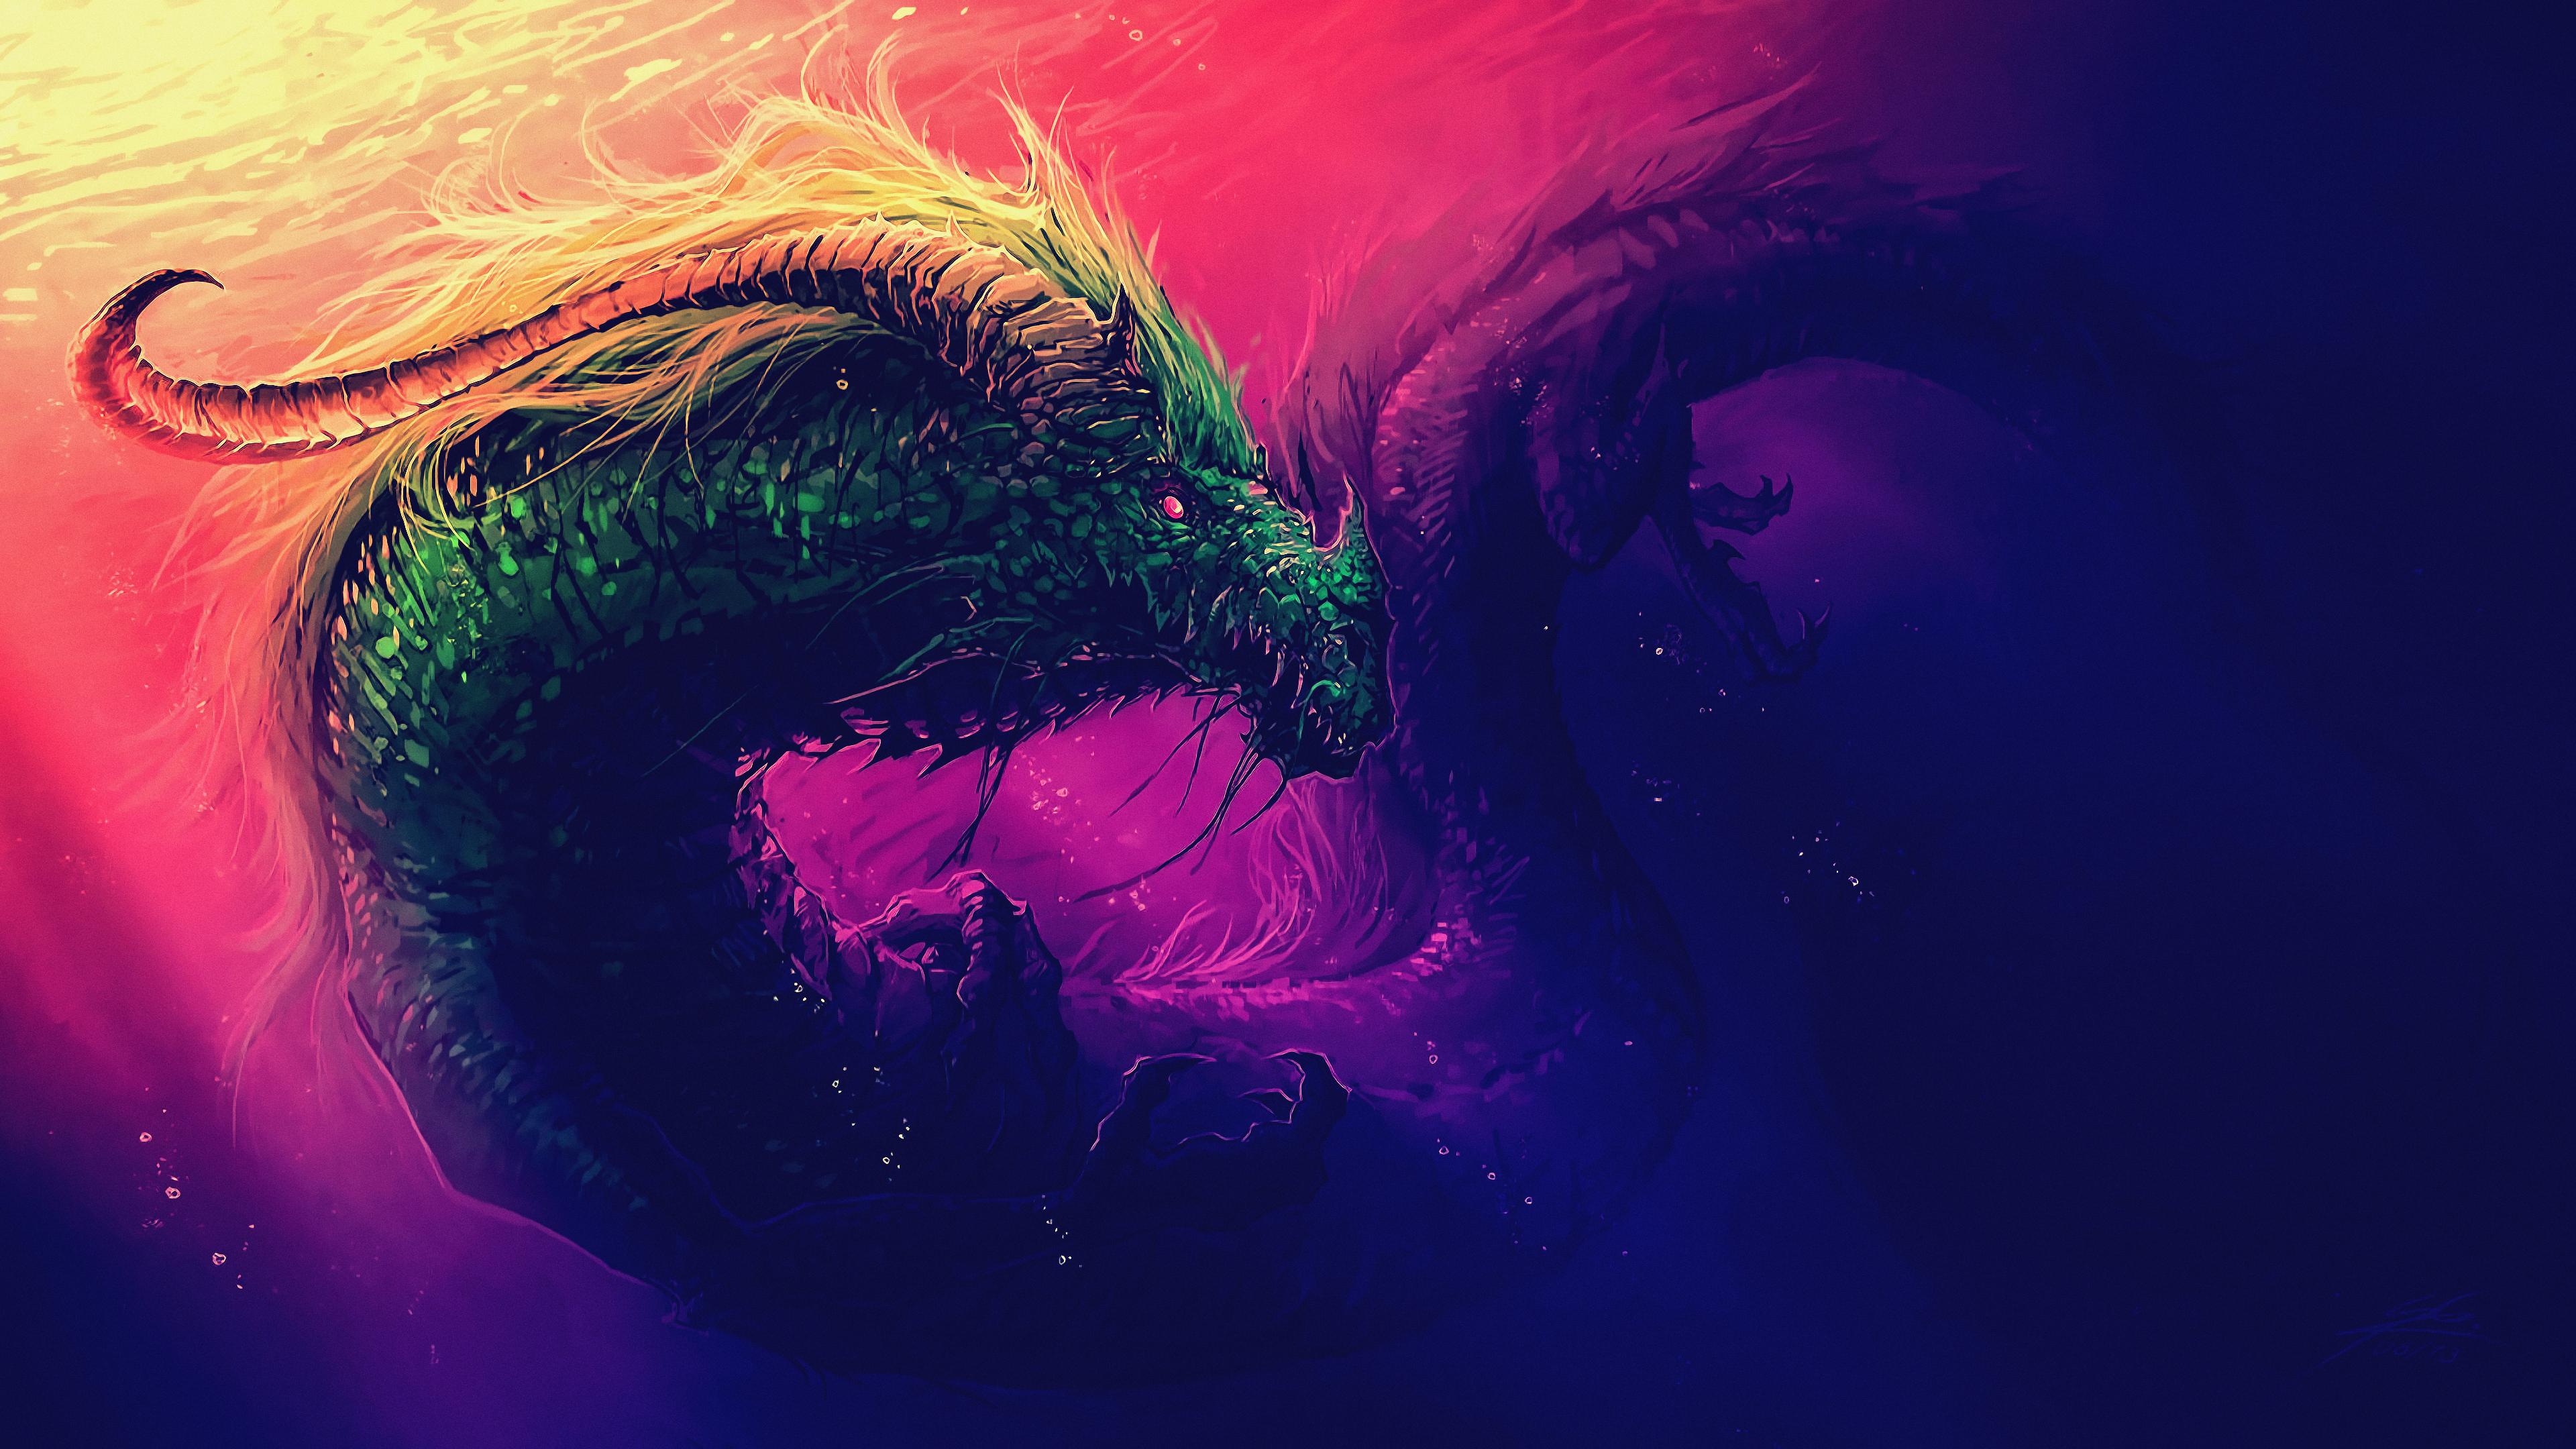 Sea Serpent Digital Art 4k, HD Artist